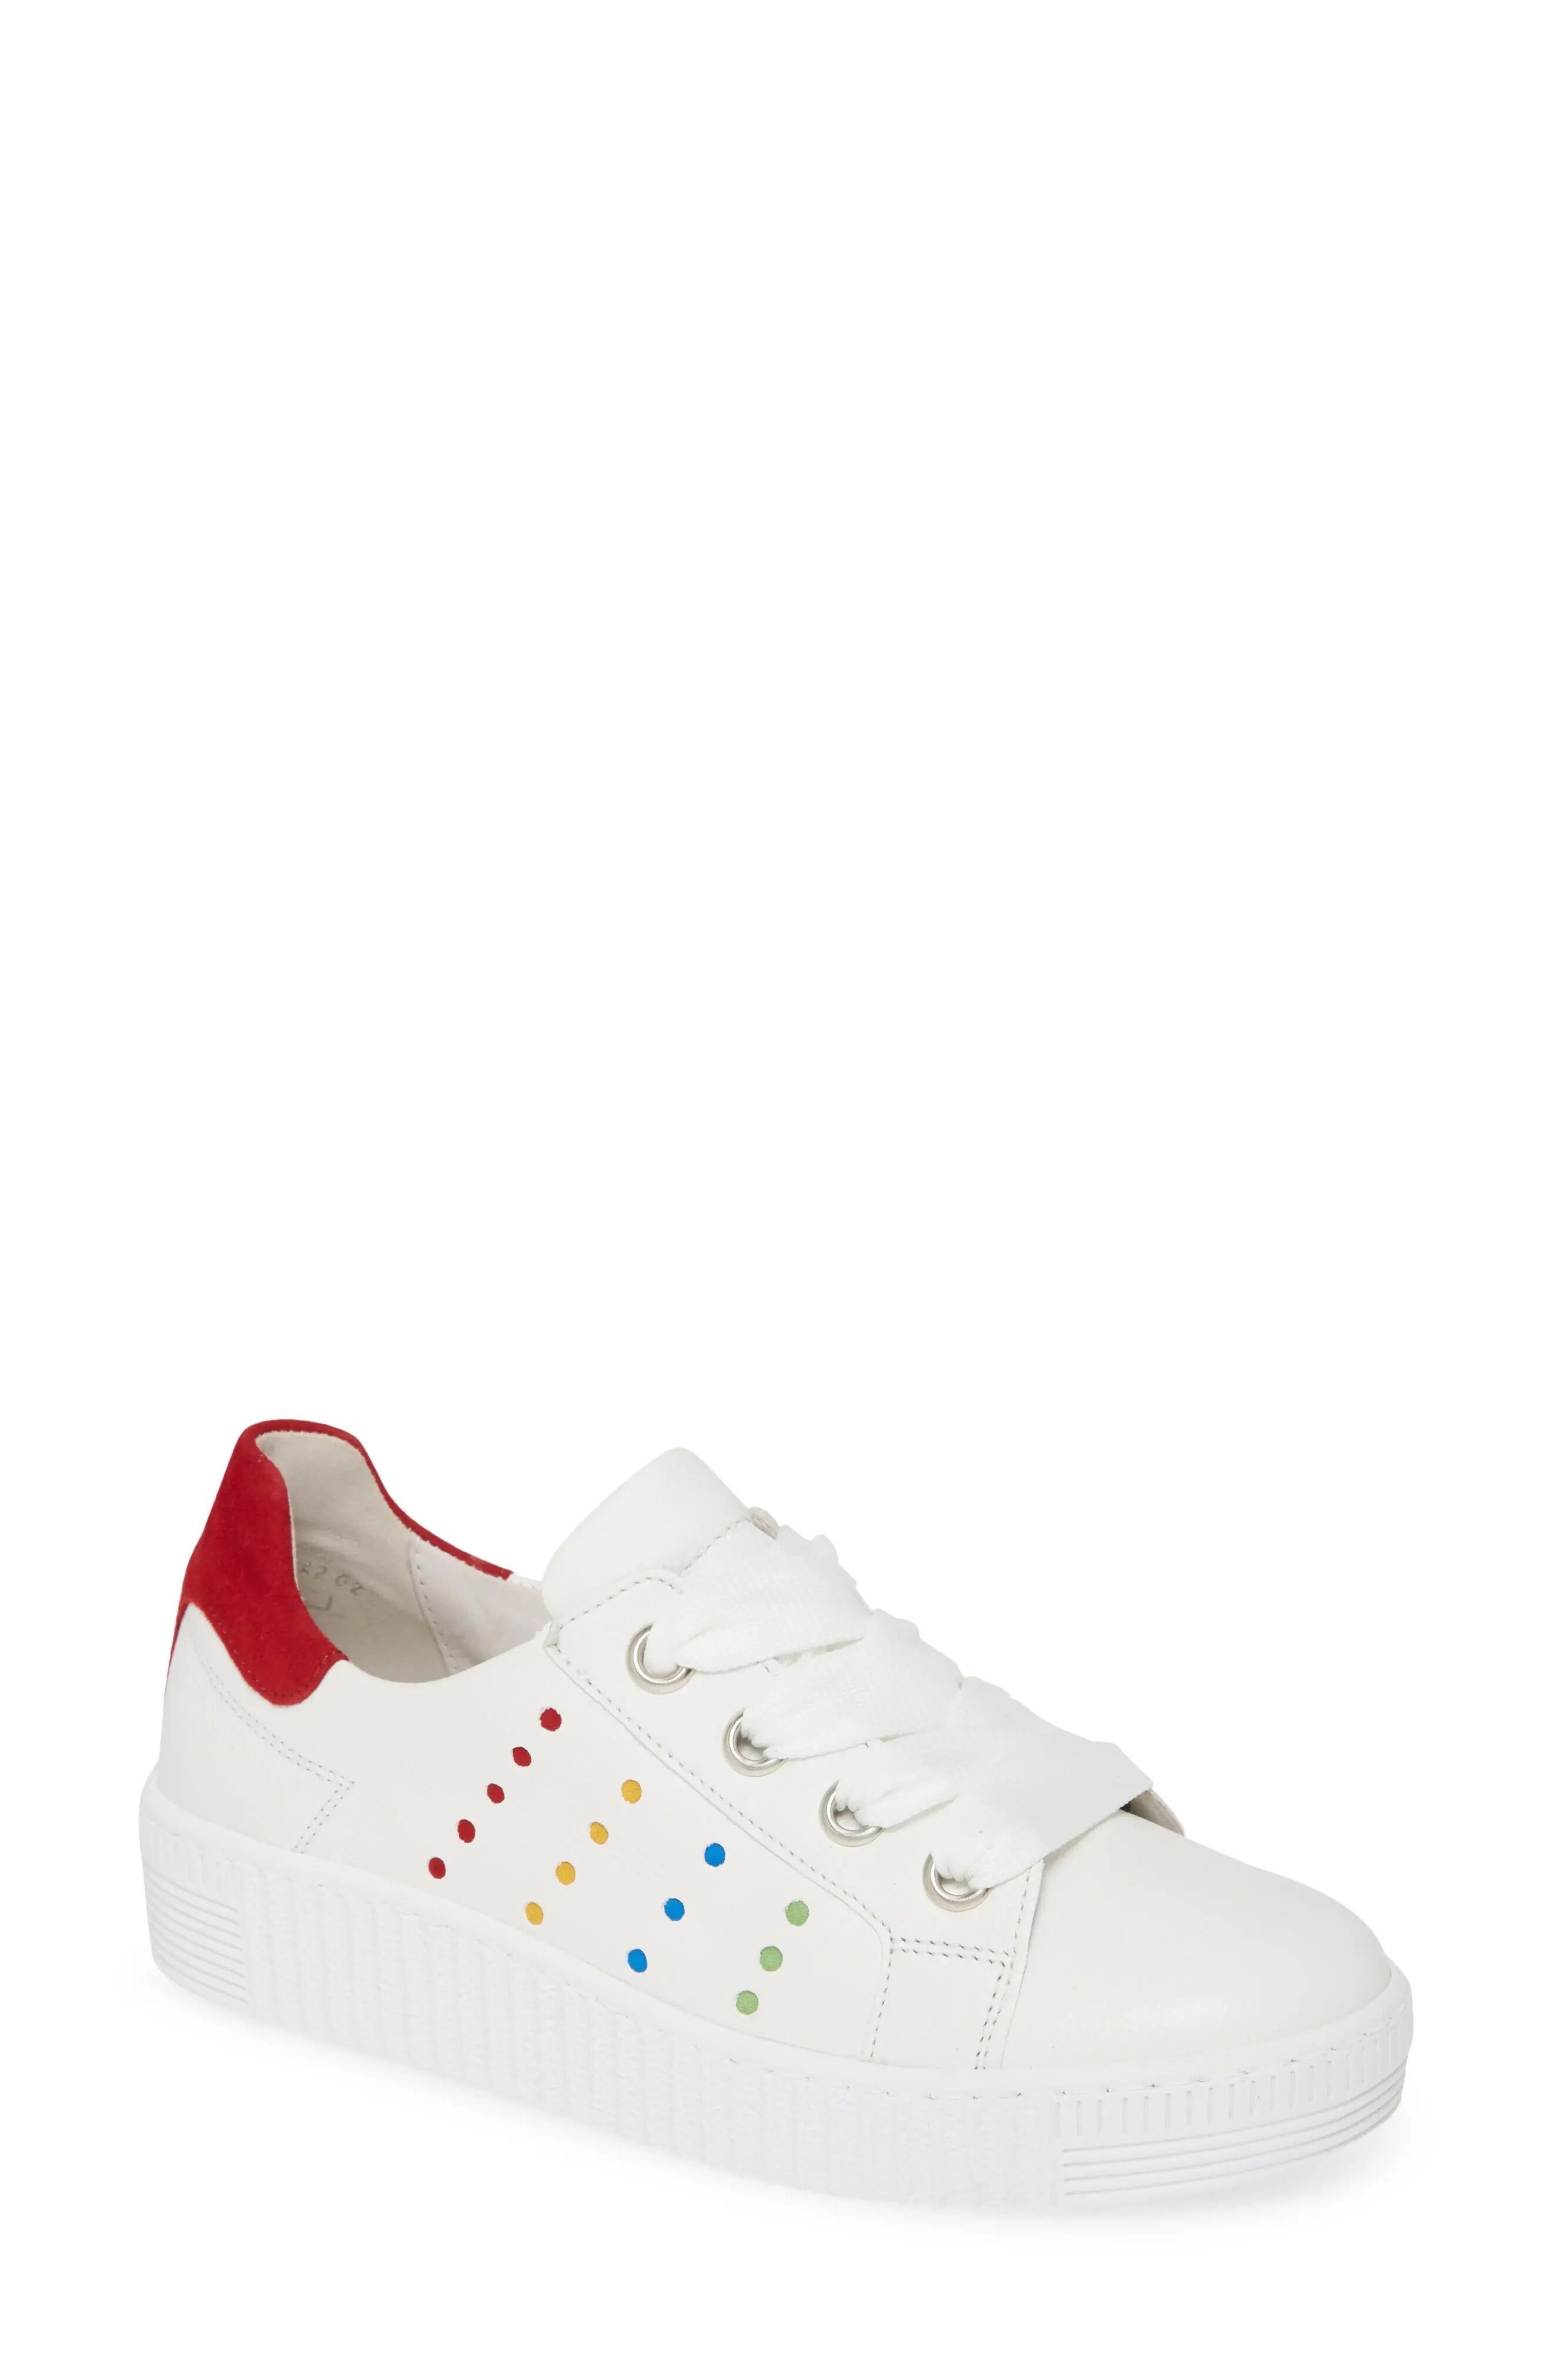 Women's Gabor Fashion Lace-Up Sneaker, Size 7.5 M - White